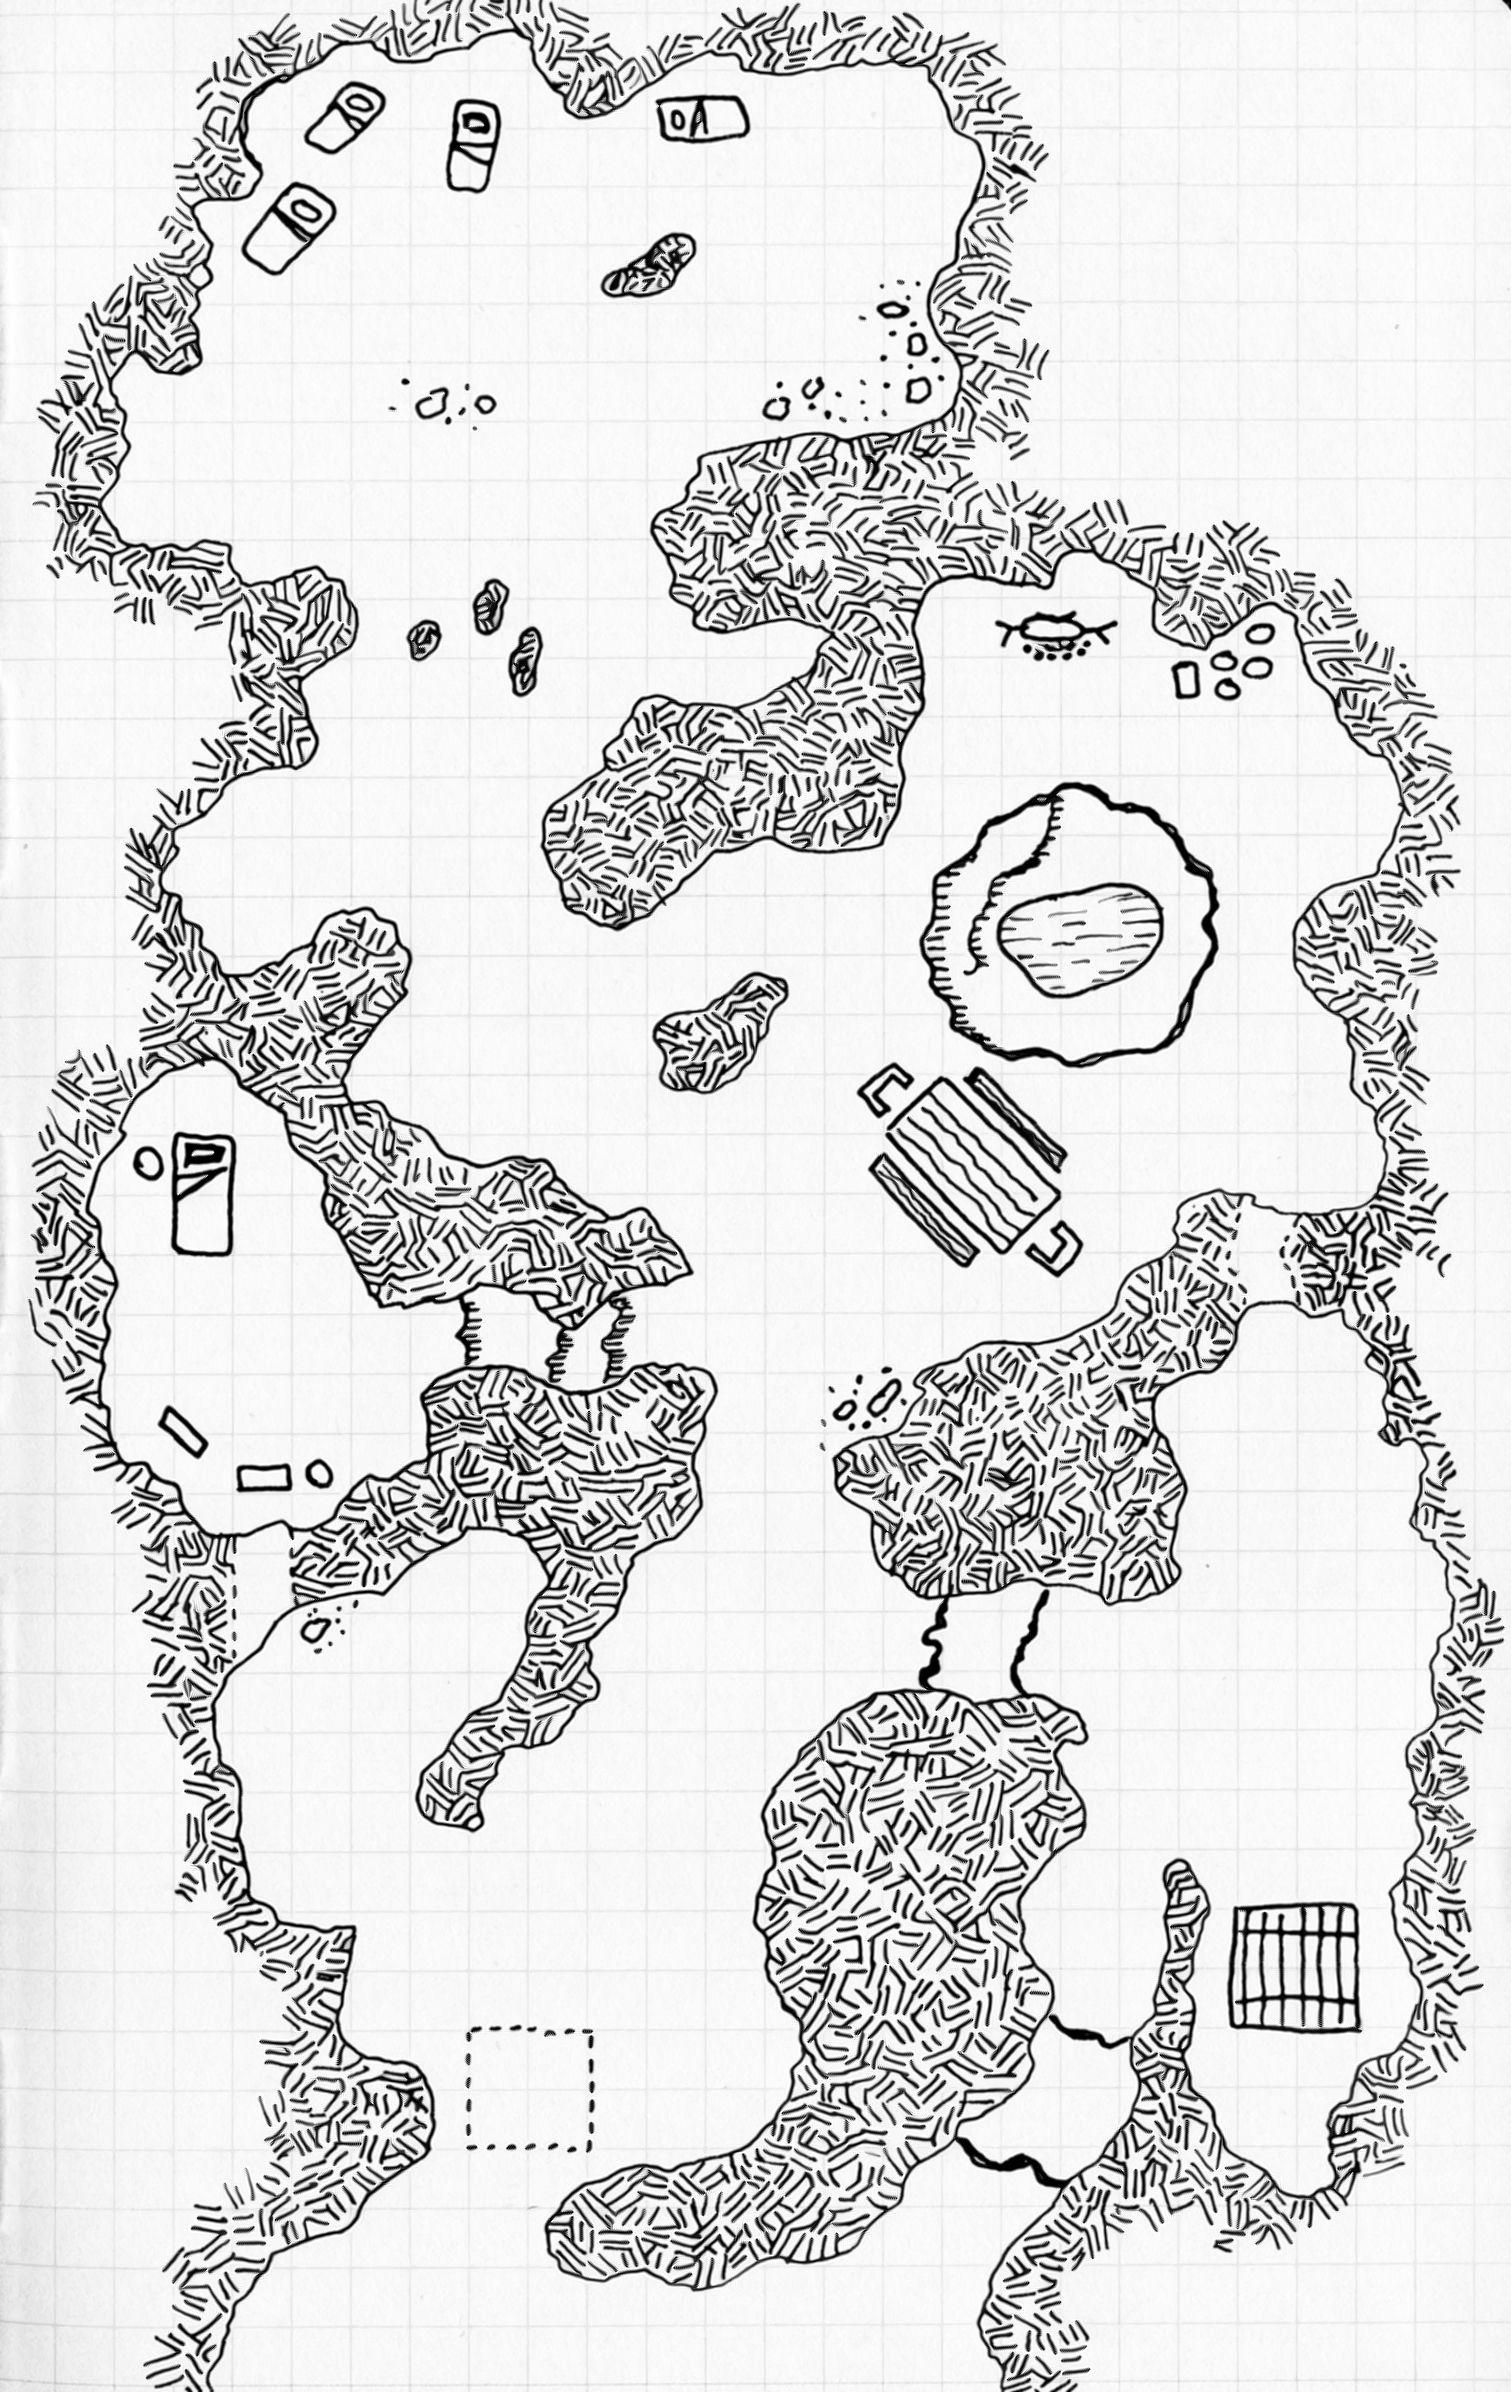 A Spy Map